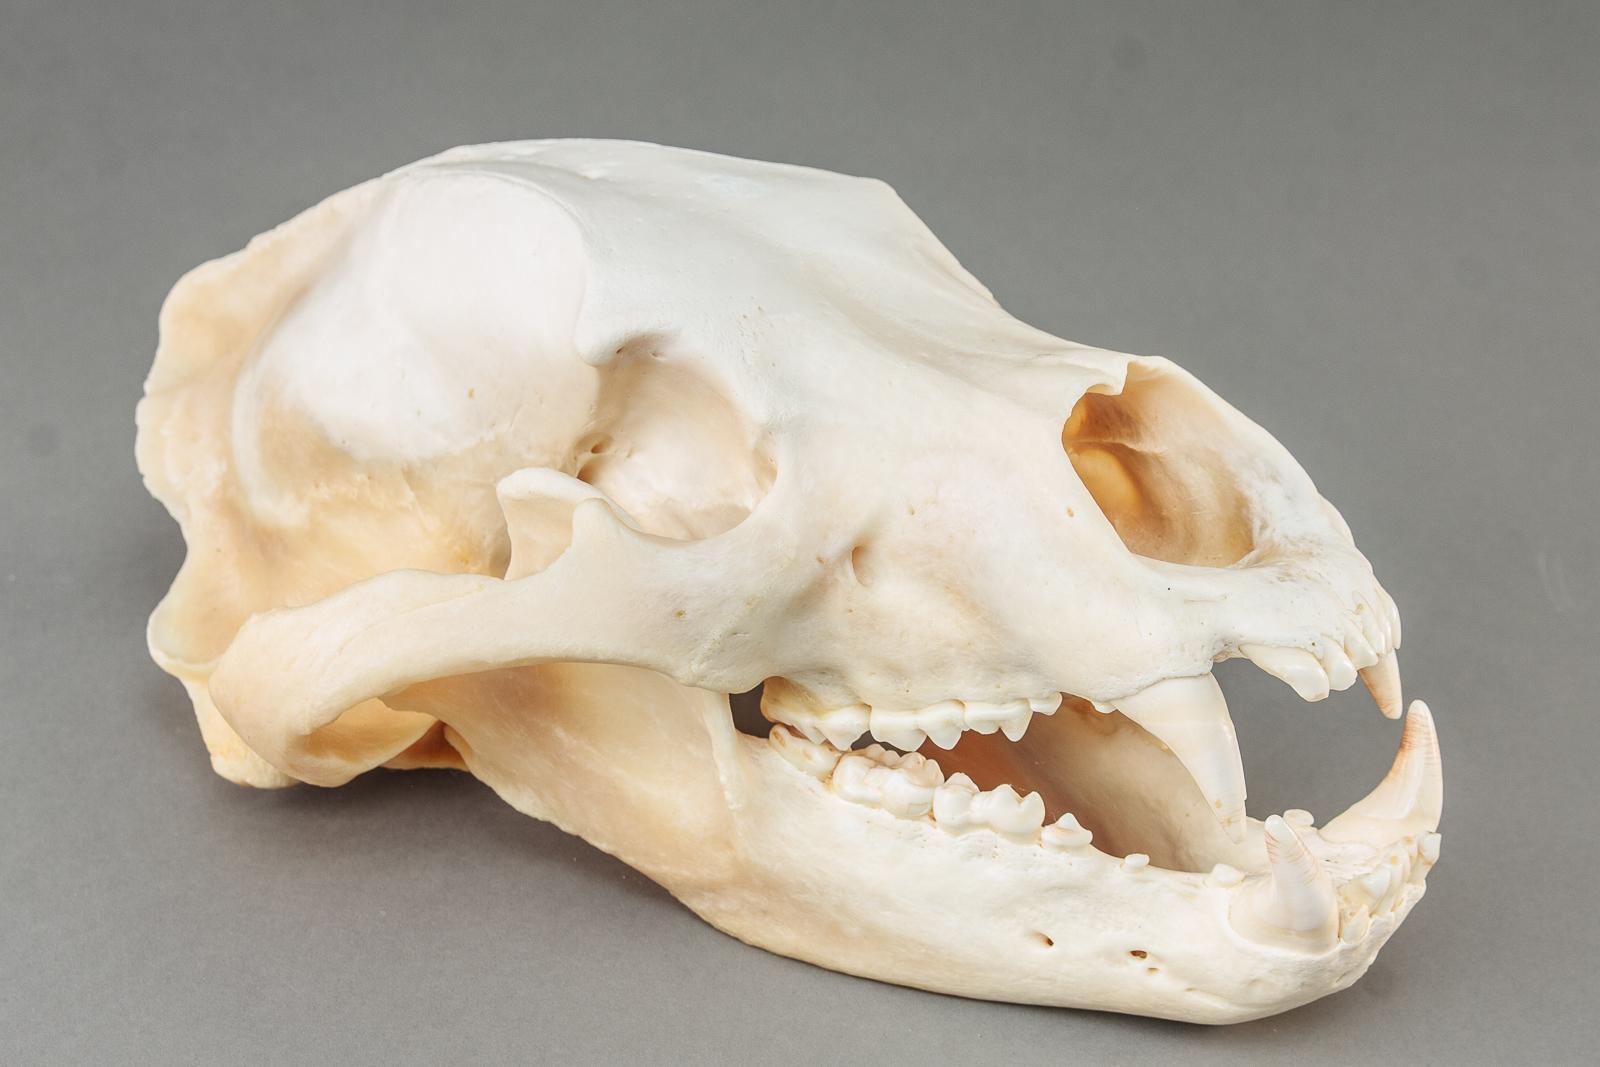 Kranie fra brunbjørn - Kranie fra brunbjørn L 38 cm